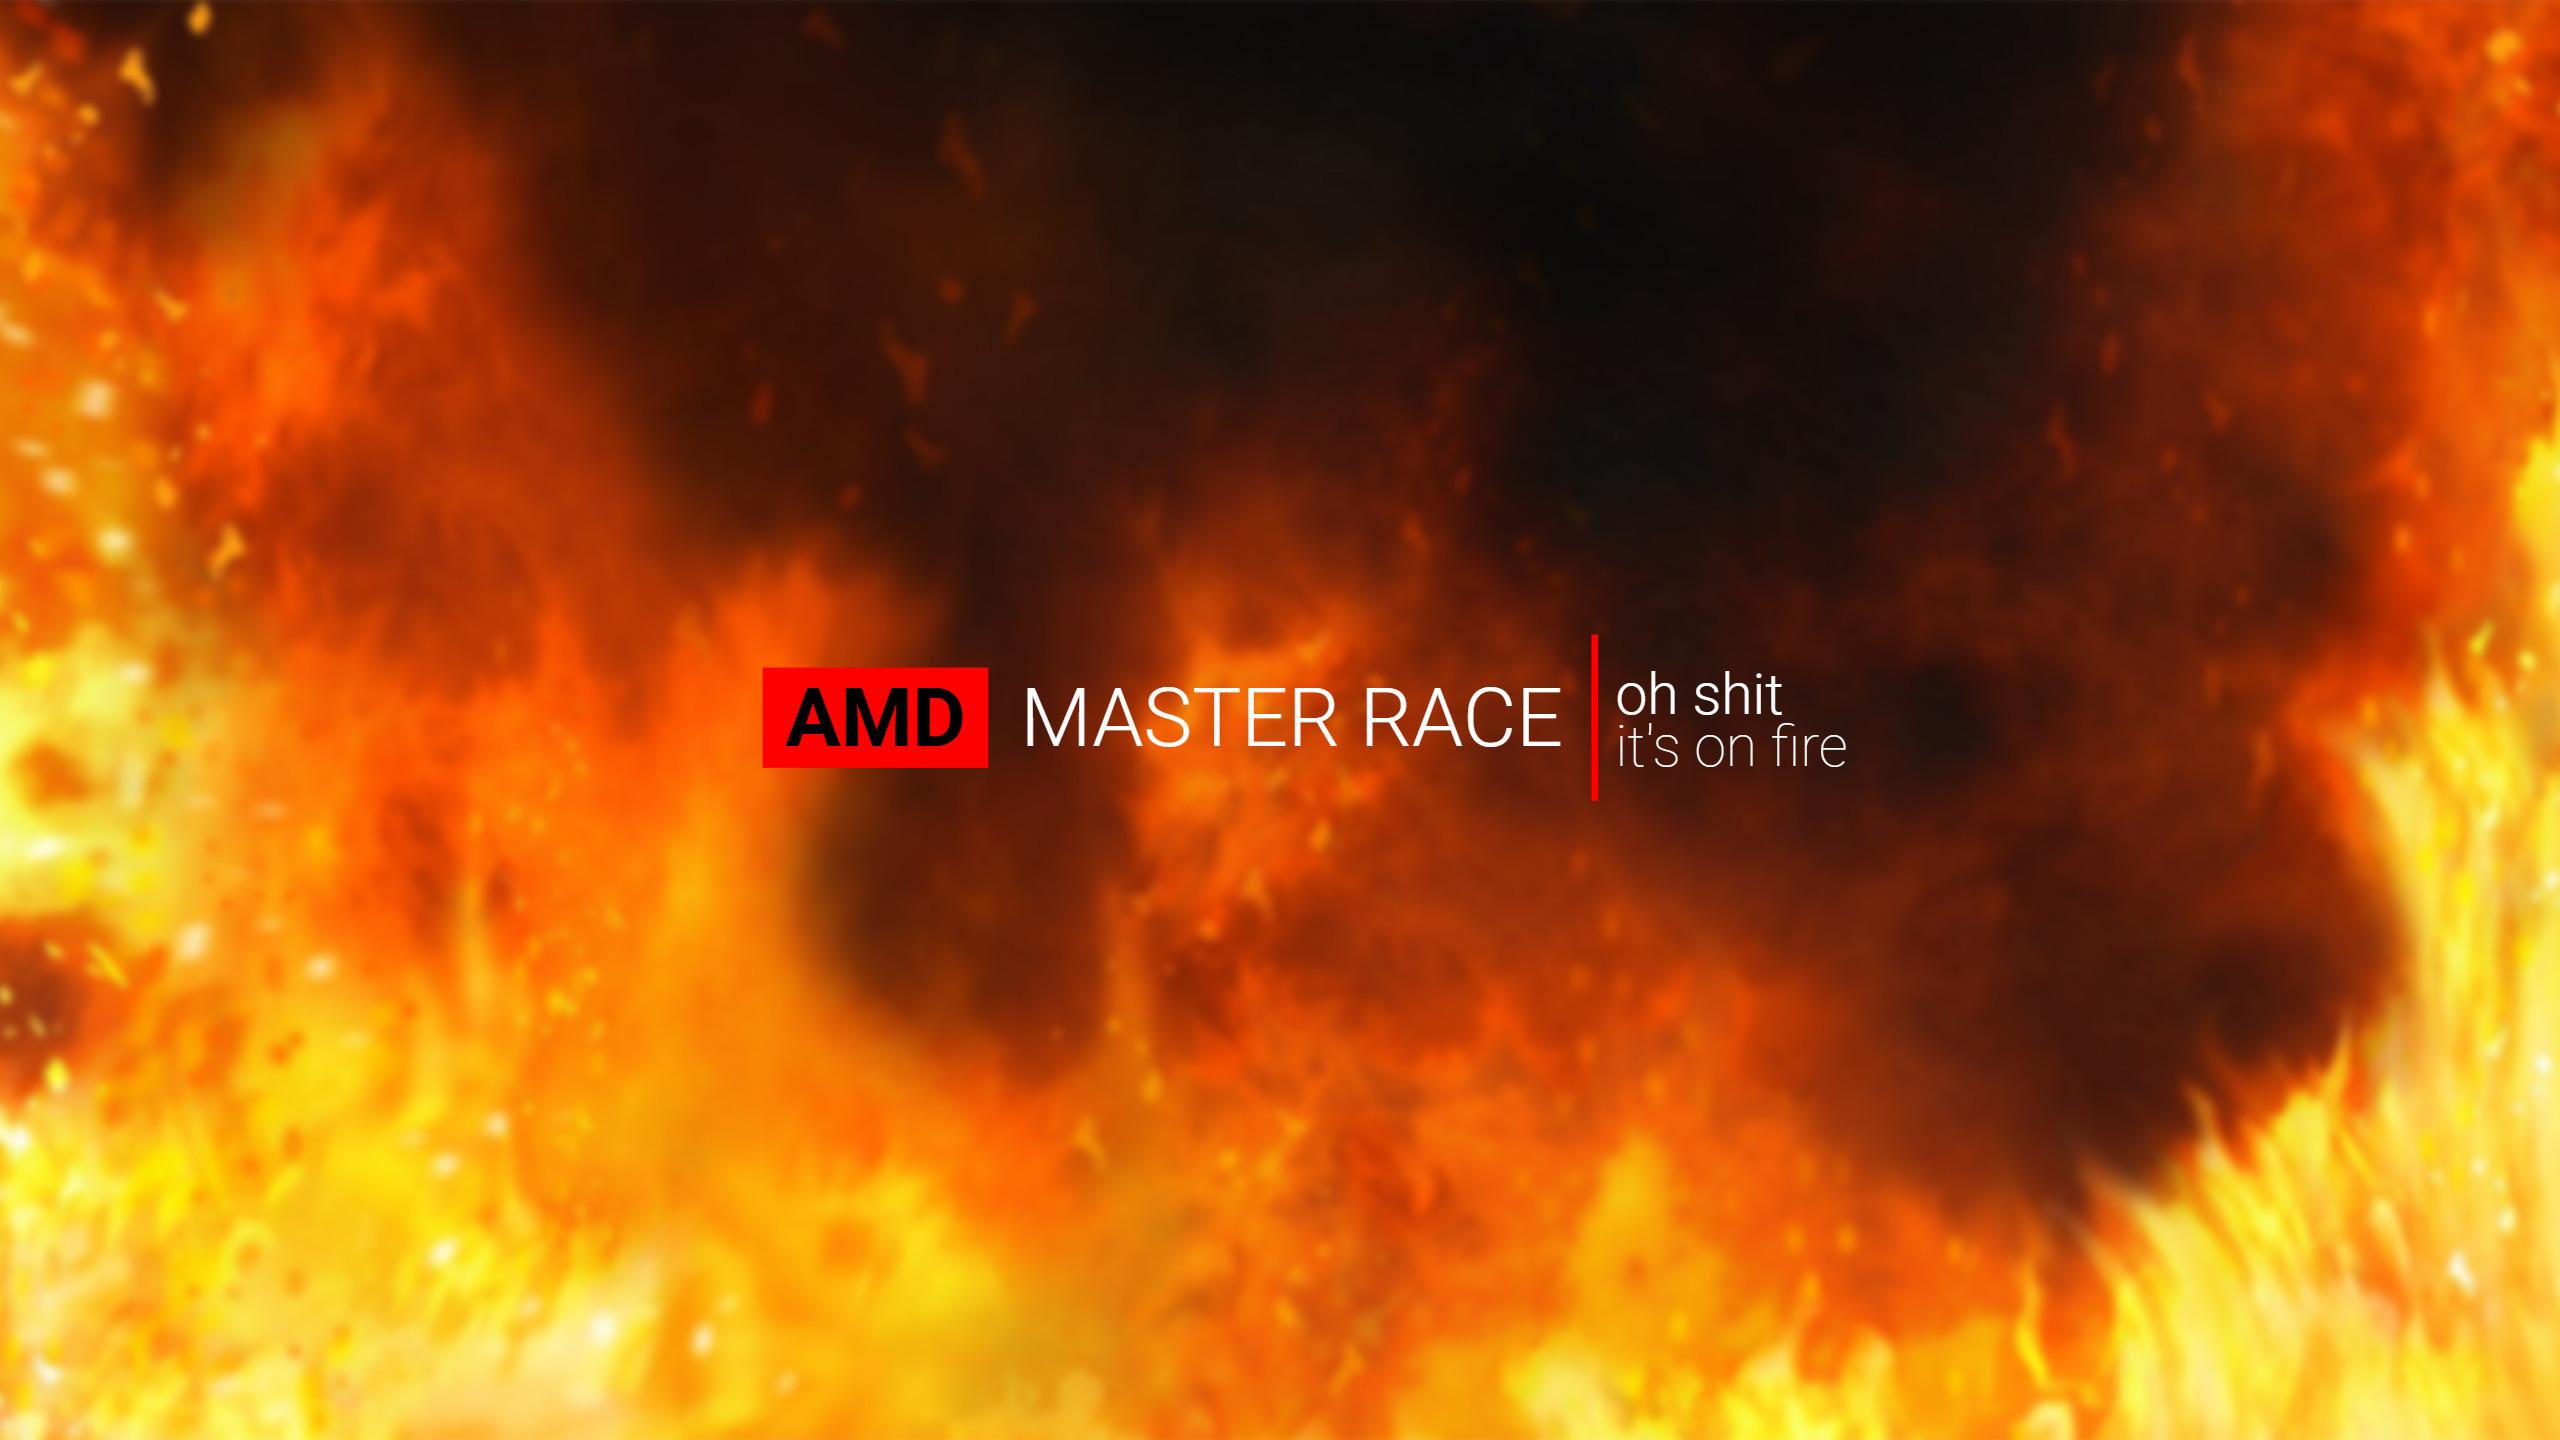 Satire/JokeMade a proper wallpaper for us AMD users.